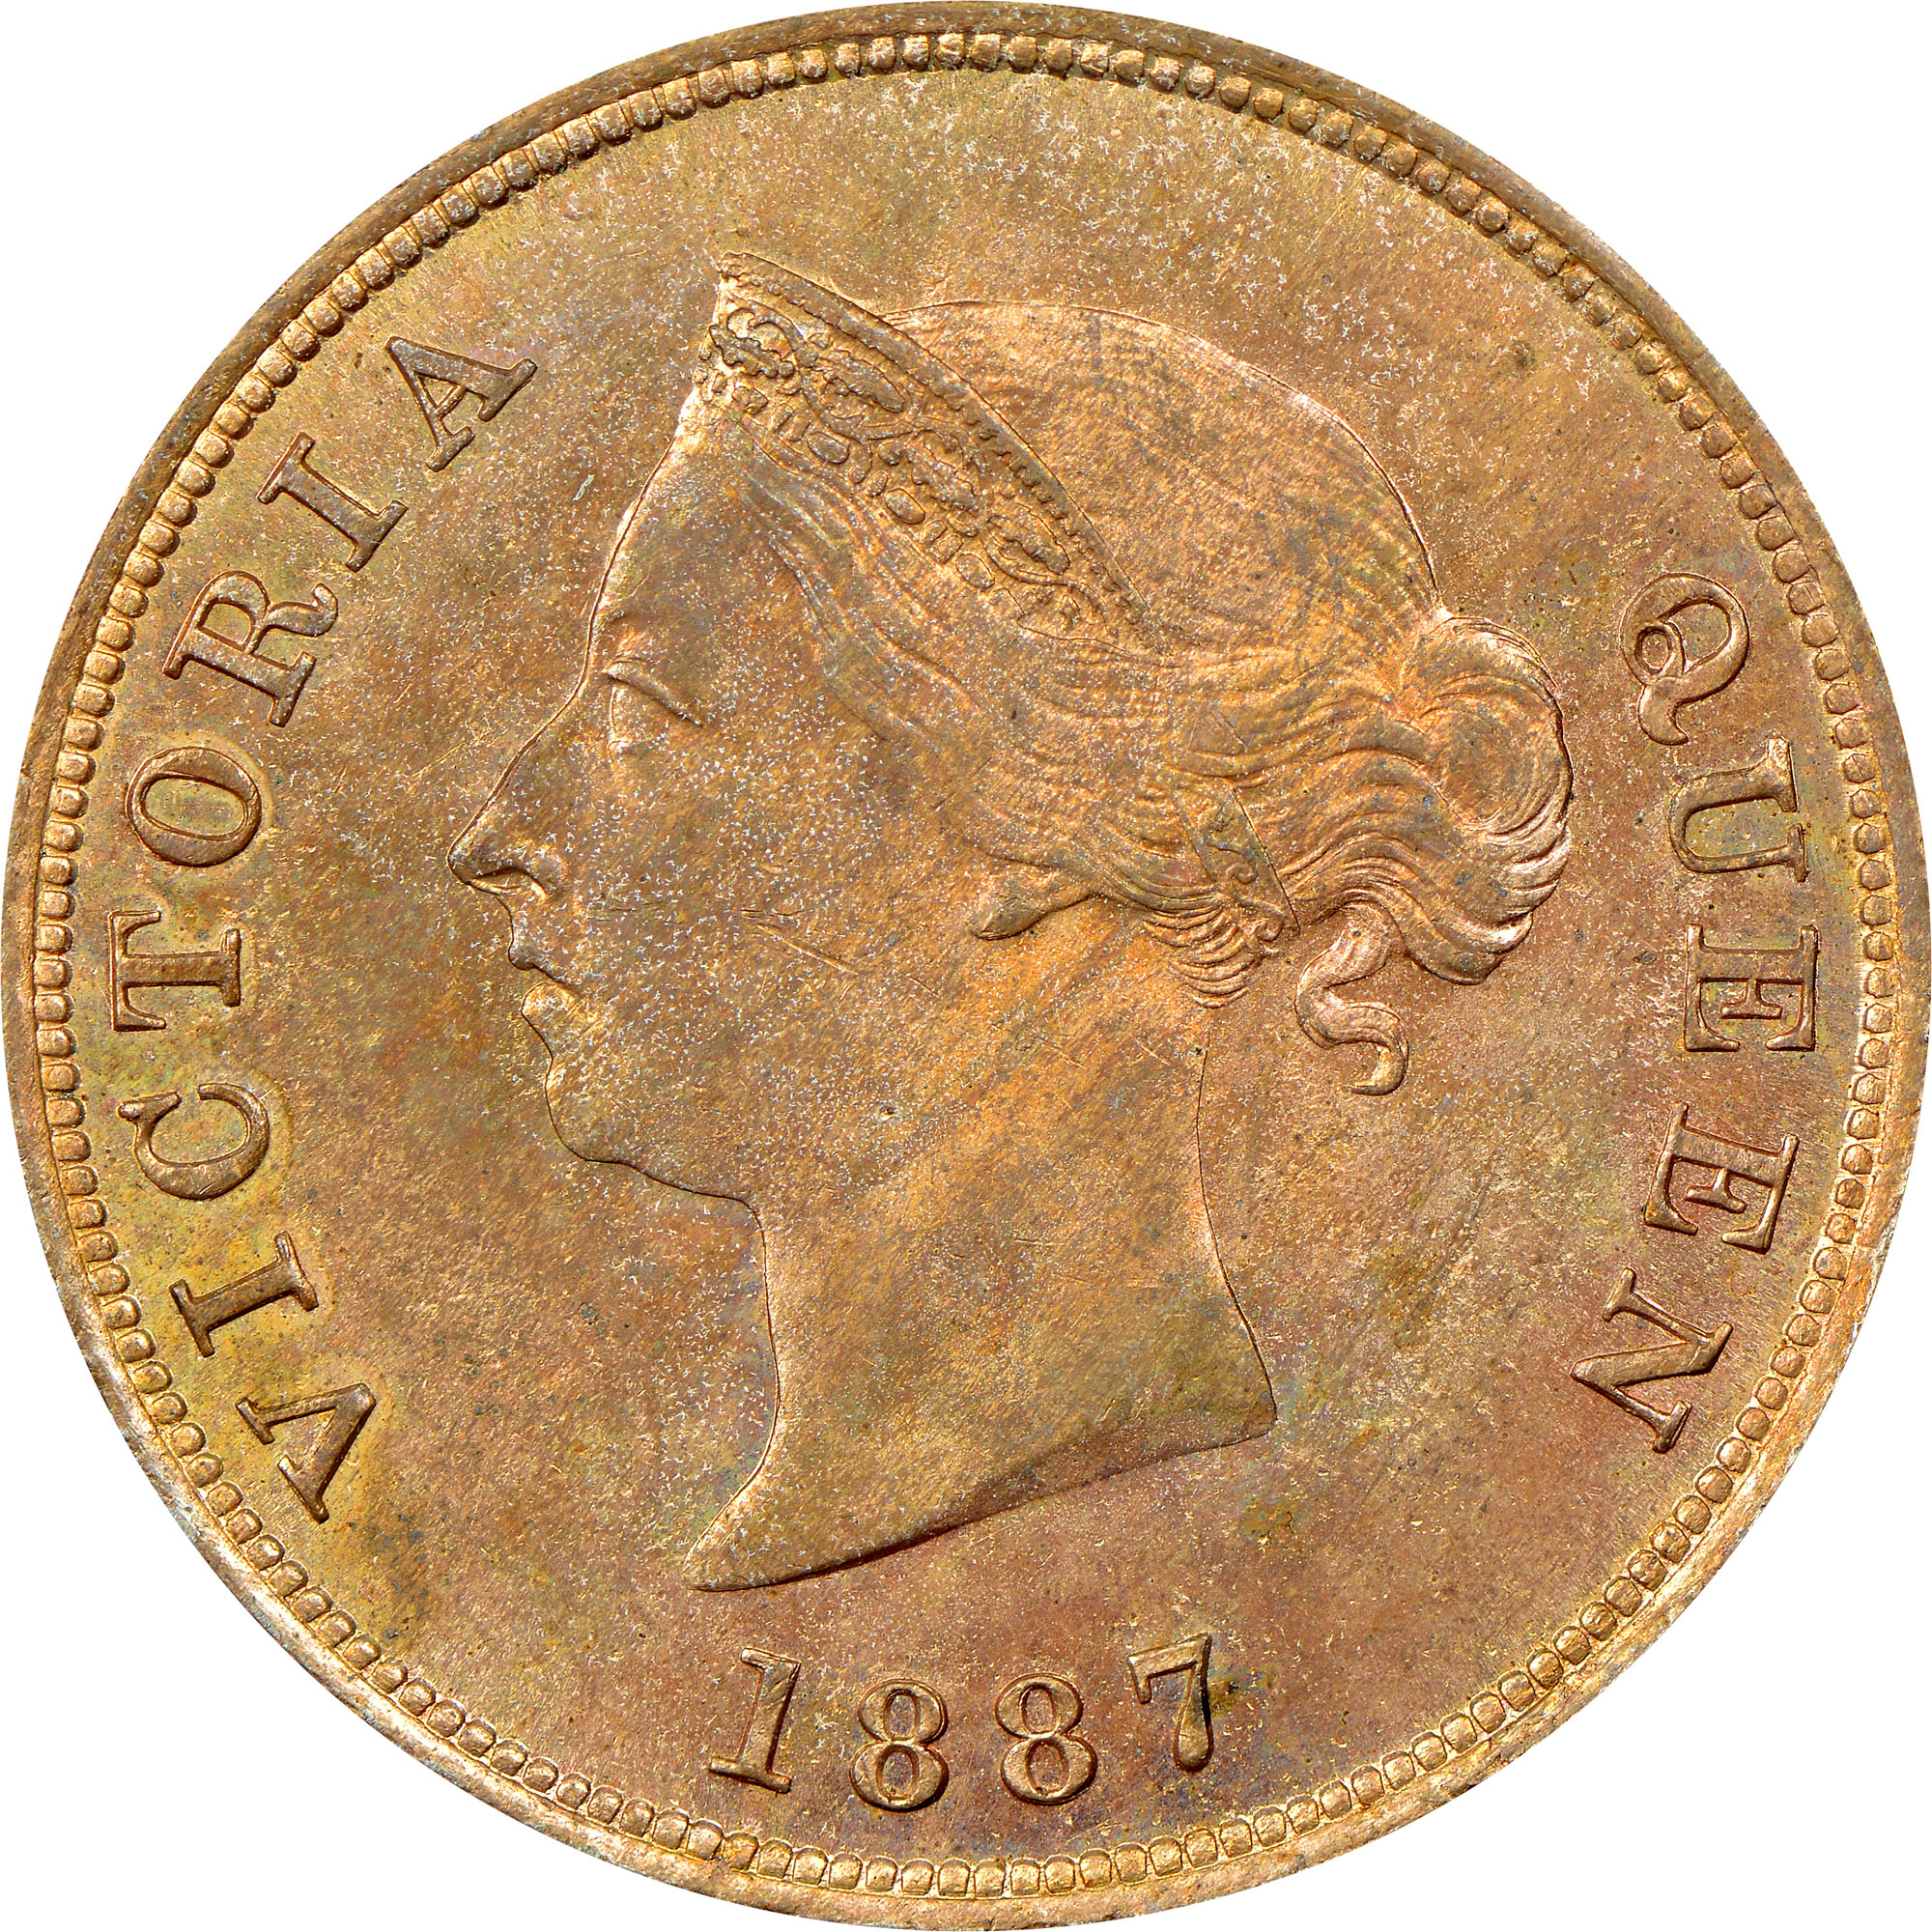 1879-1900 Cyprus 1/2 Piastre obverse